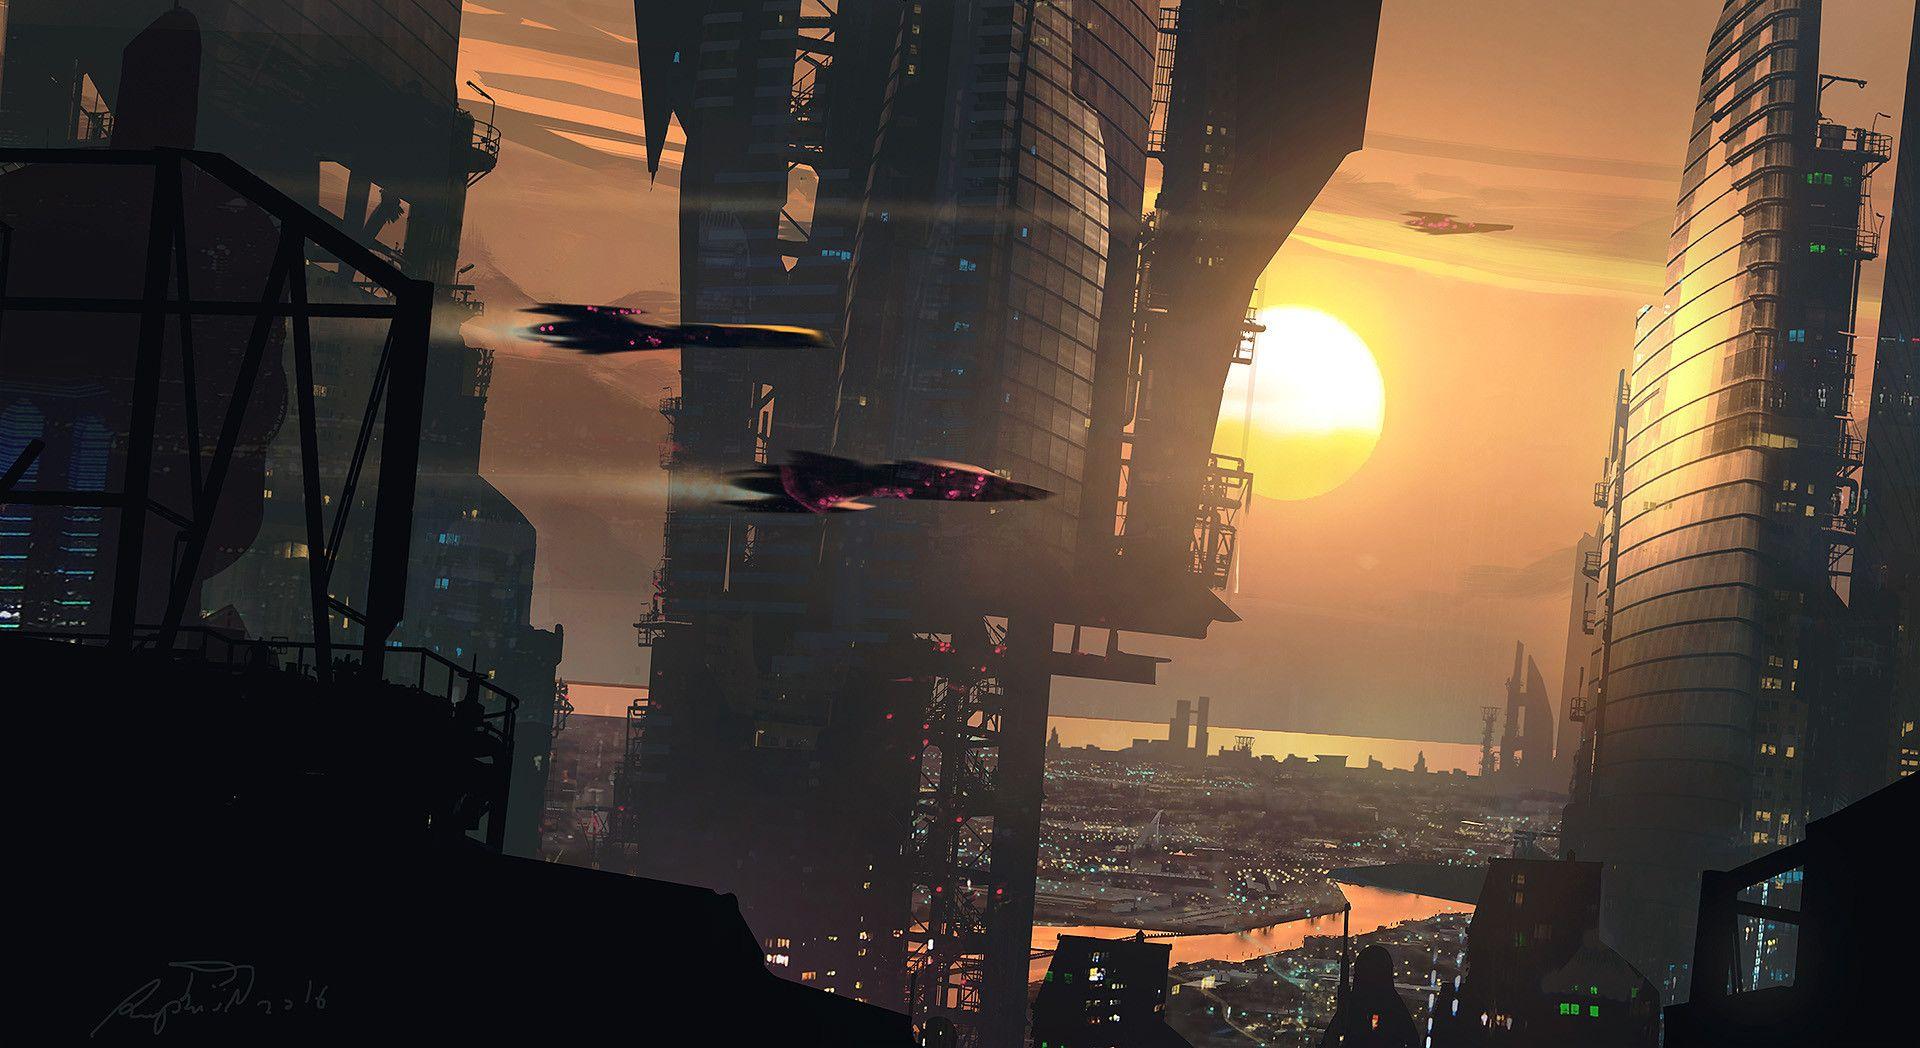 ArtStation - Sunset City / Warm Up, Raphael Lacoste